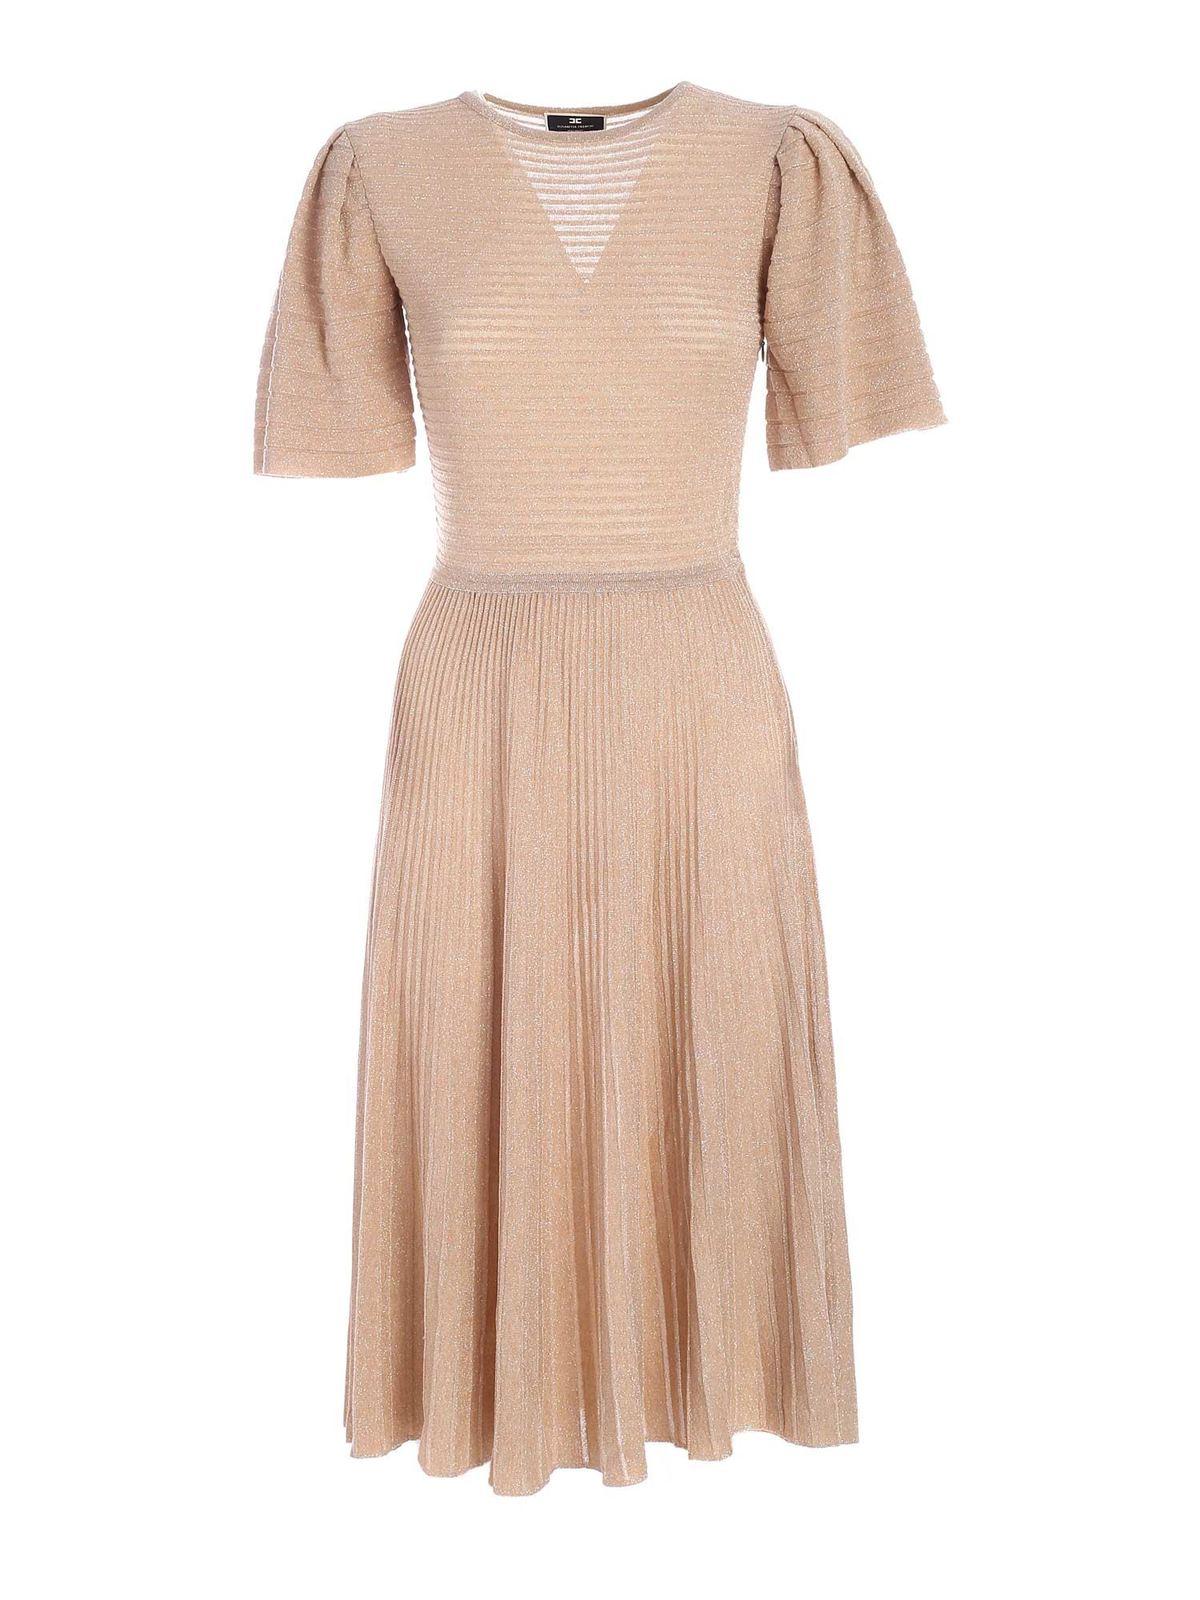 Elisabetta Franchi LAME DETAILS DRESS IN BEIGE